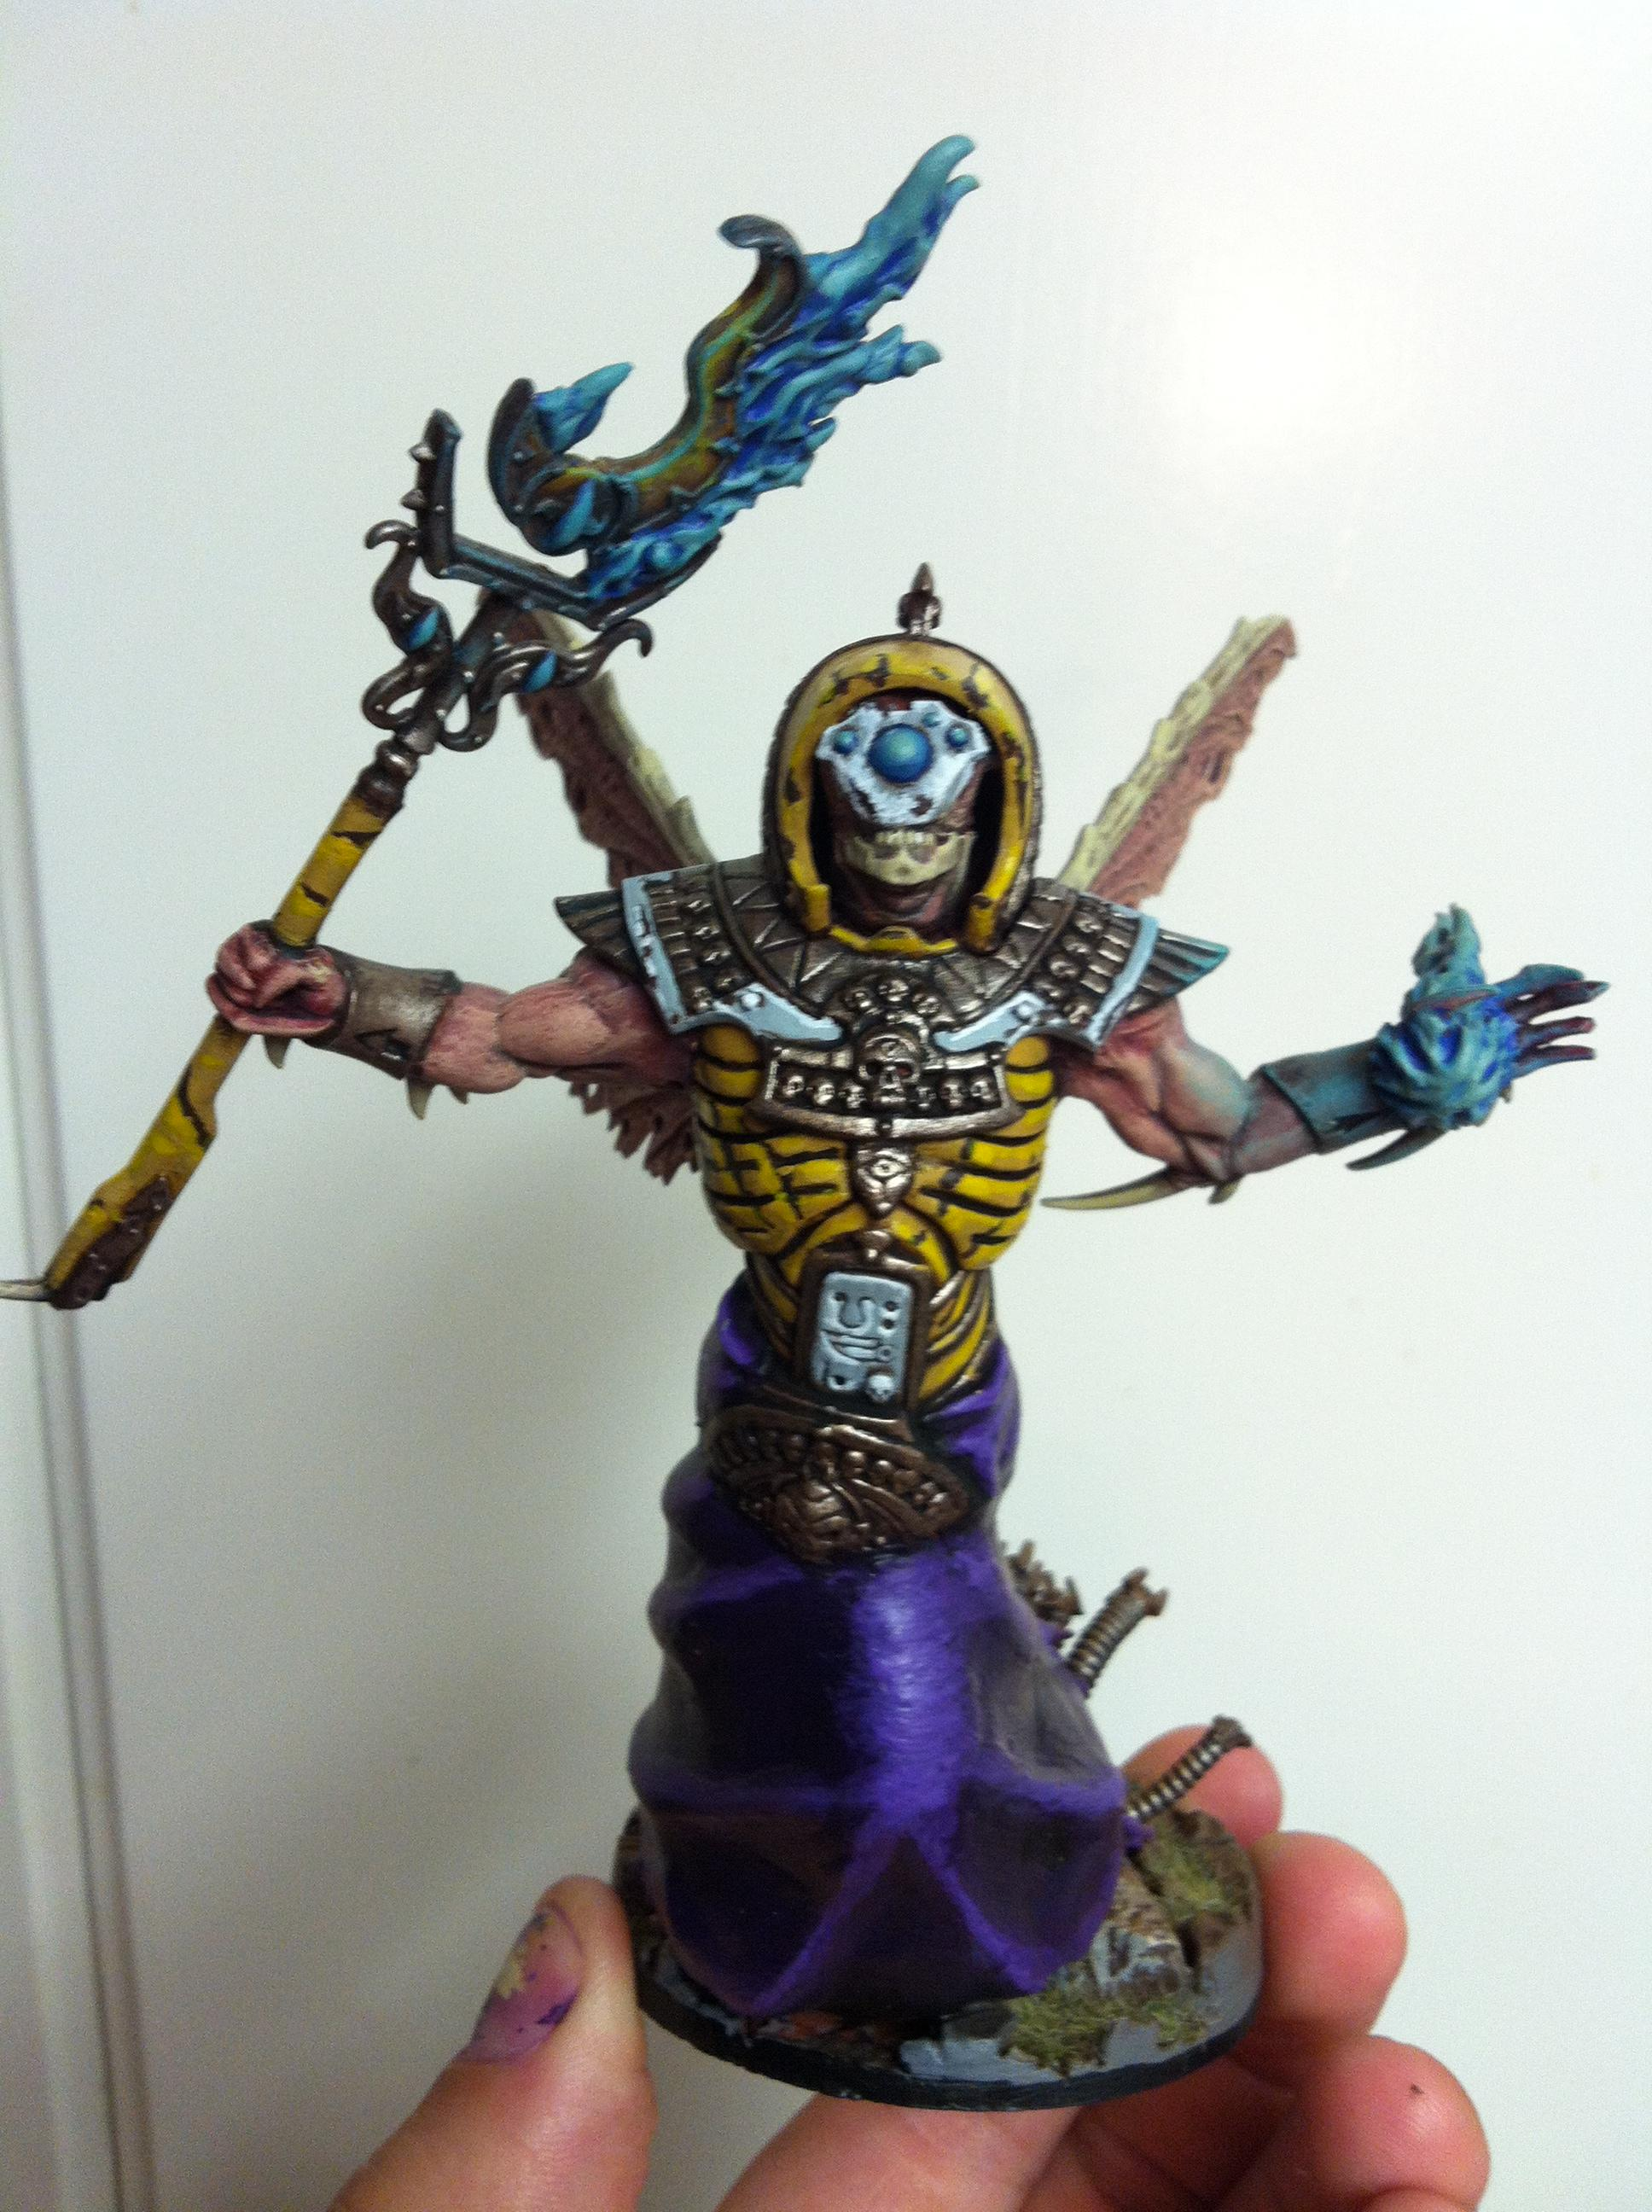 Fateweaver, Fmc, Greater Daemon, Lord Of Change, Monstrous Creature, Tzeentch